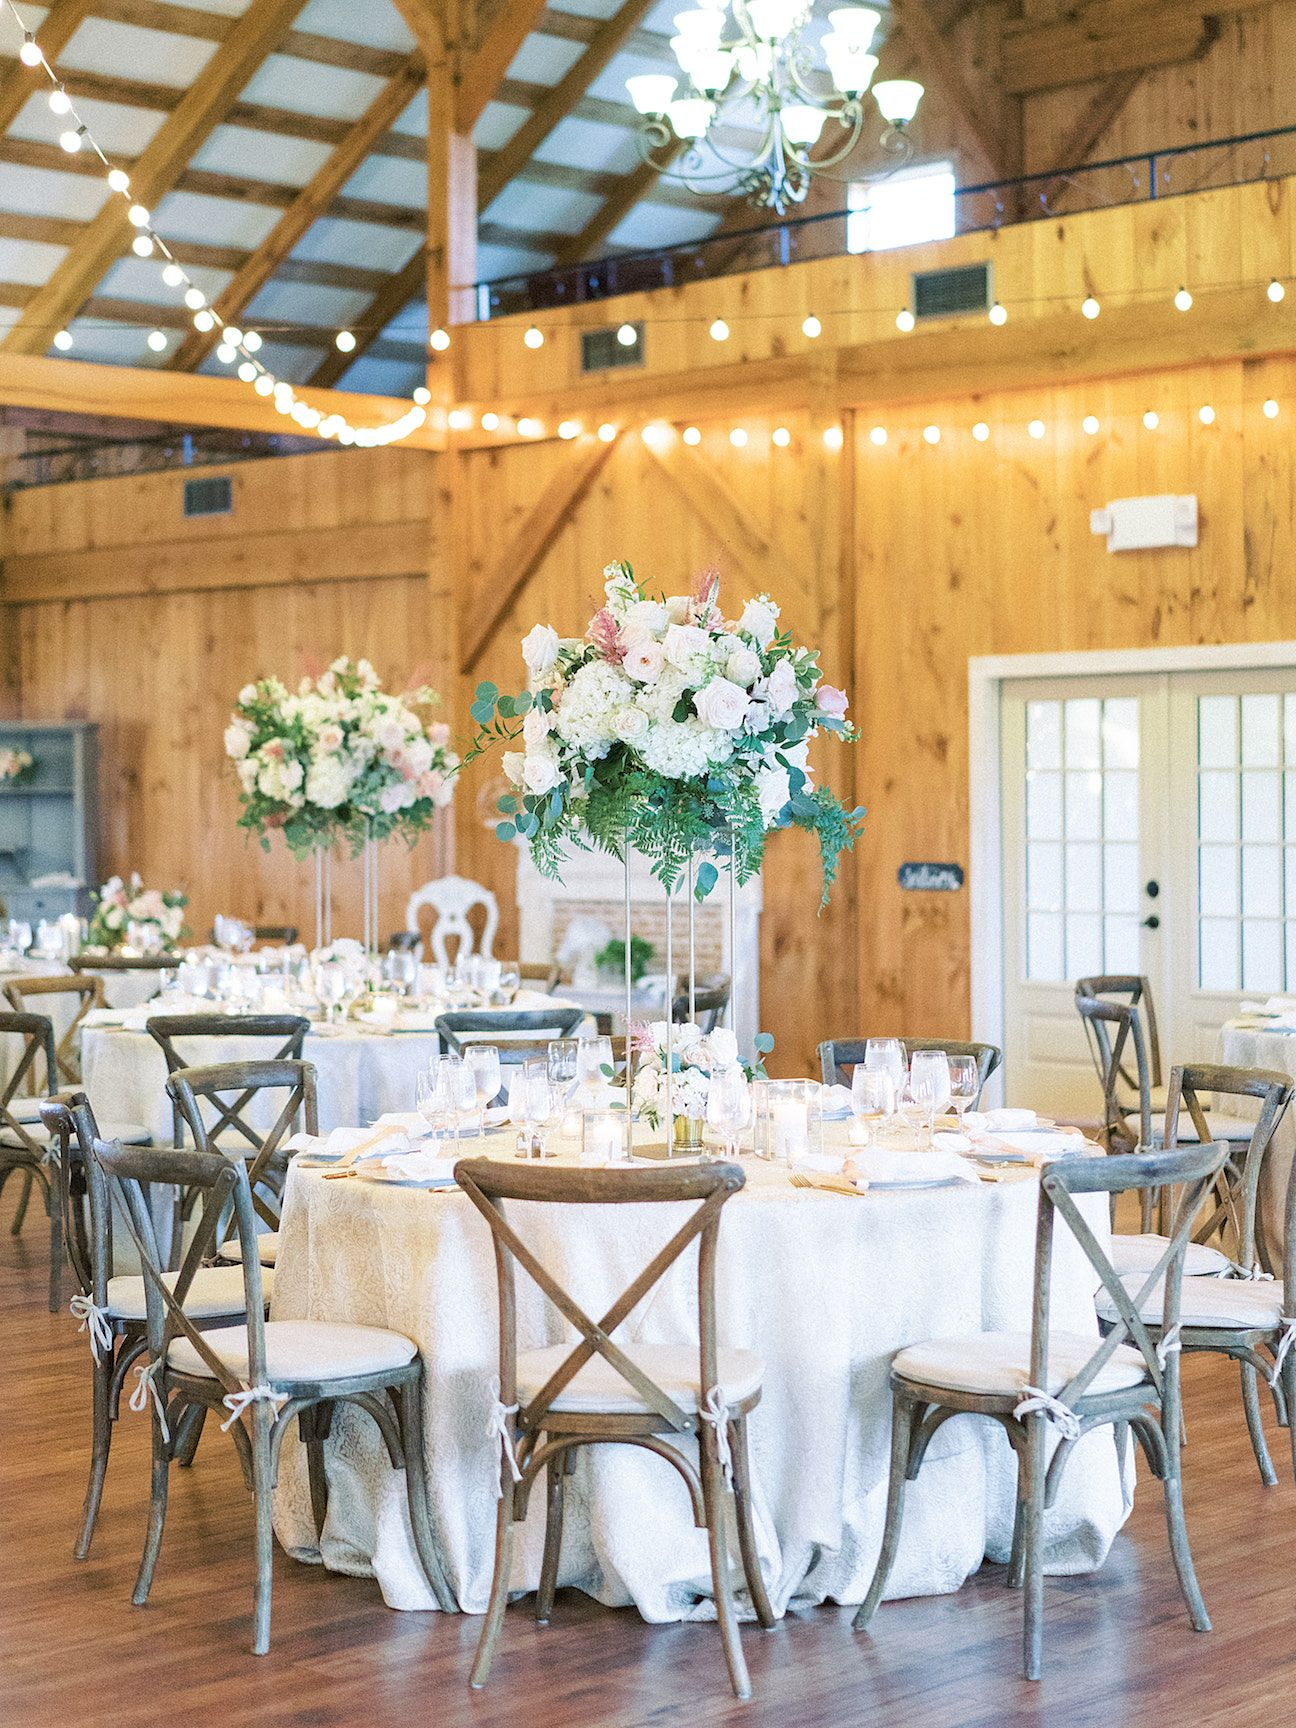 Adam + Lauren Barn wedding venue, Barn wedding, Wedding